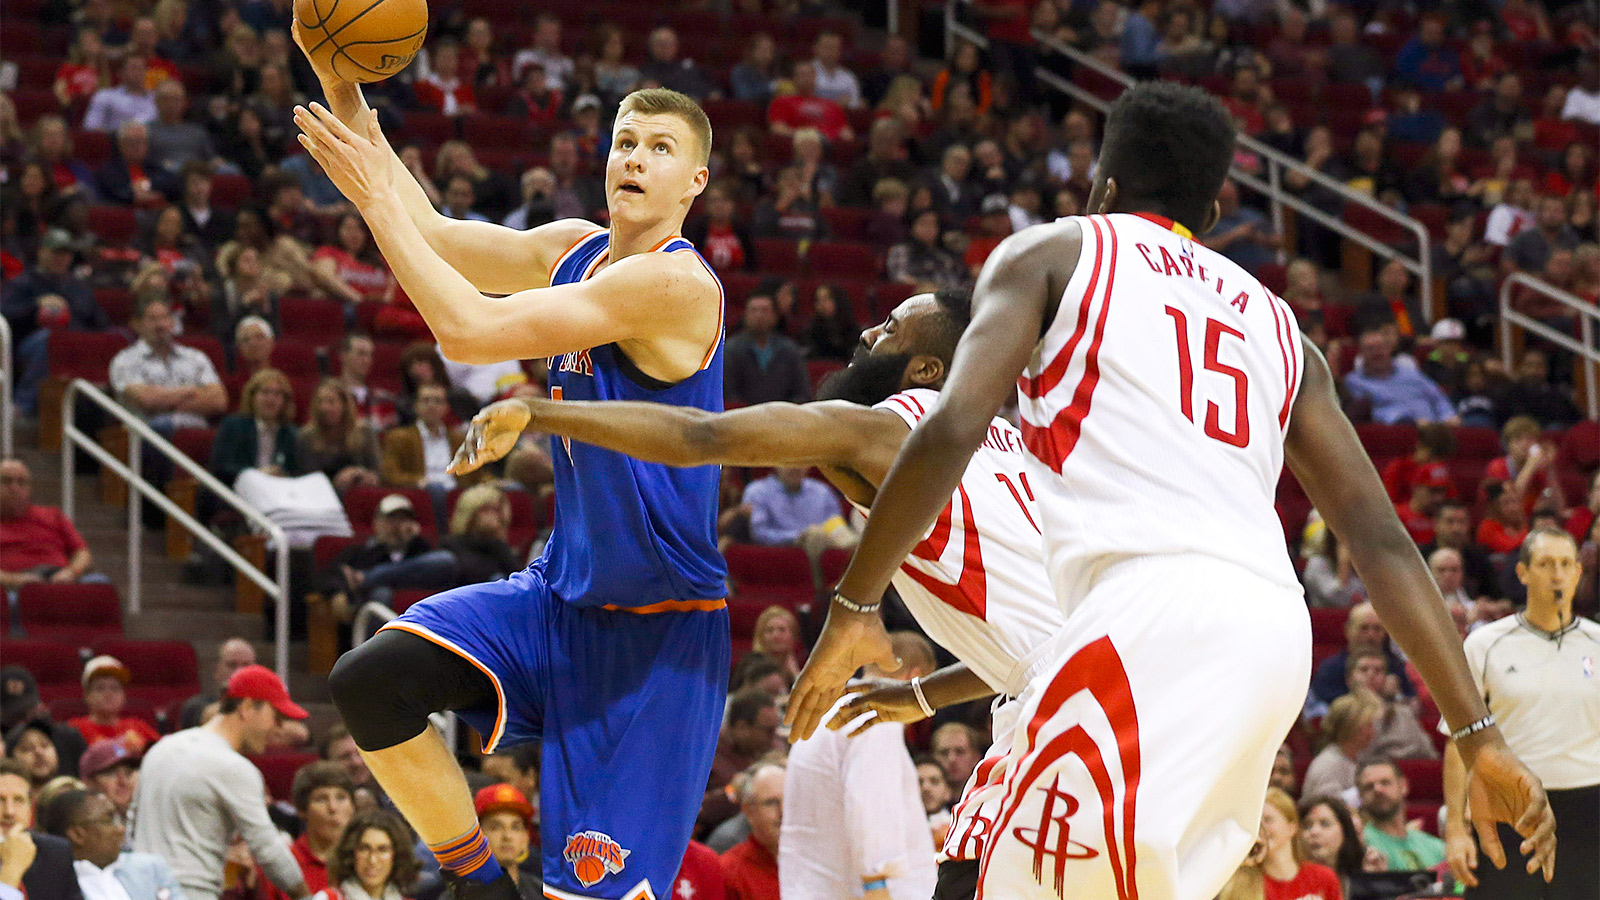 Porzingis, Knicks continue upswing, end losing streak to Rockets